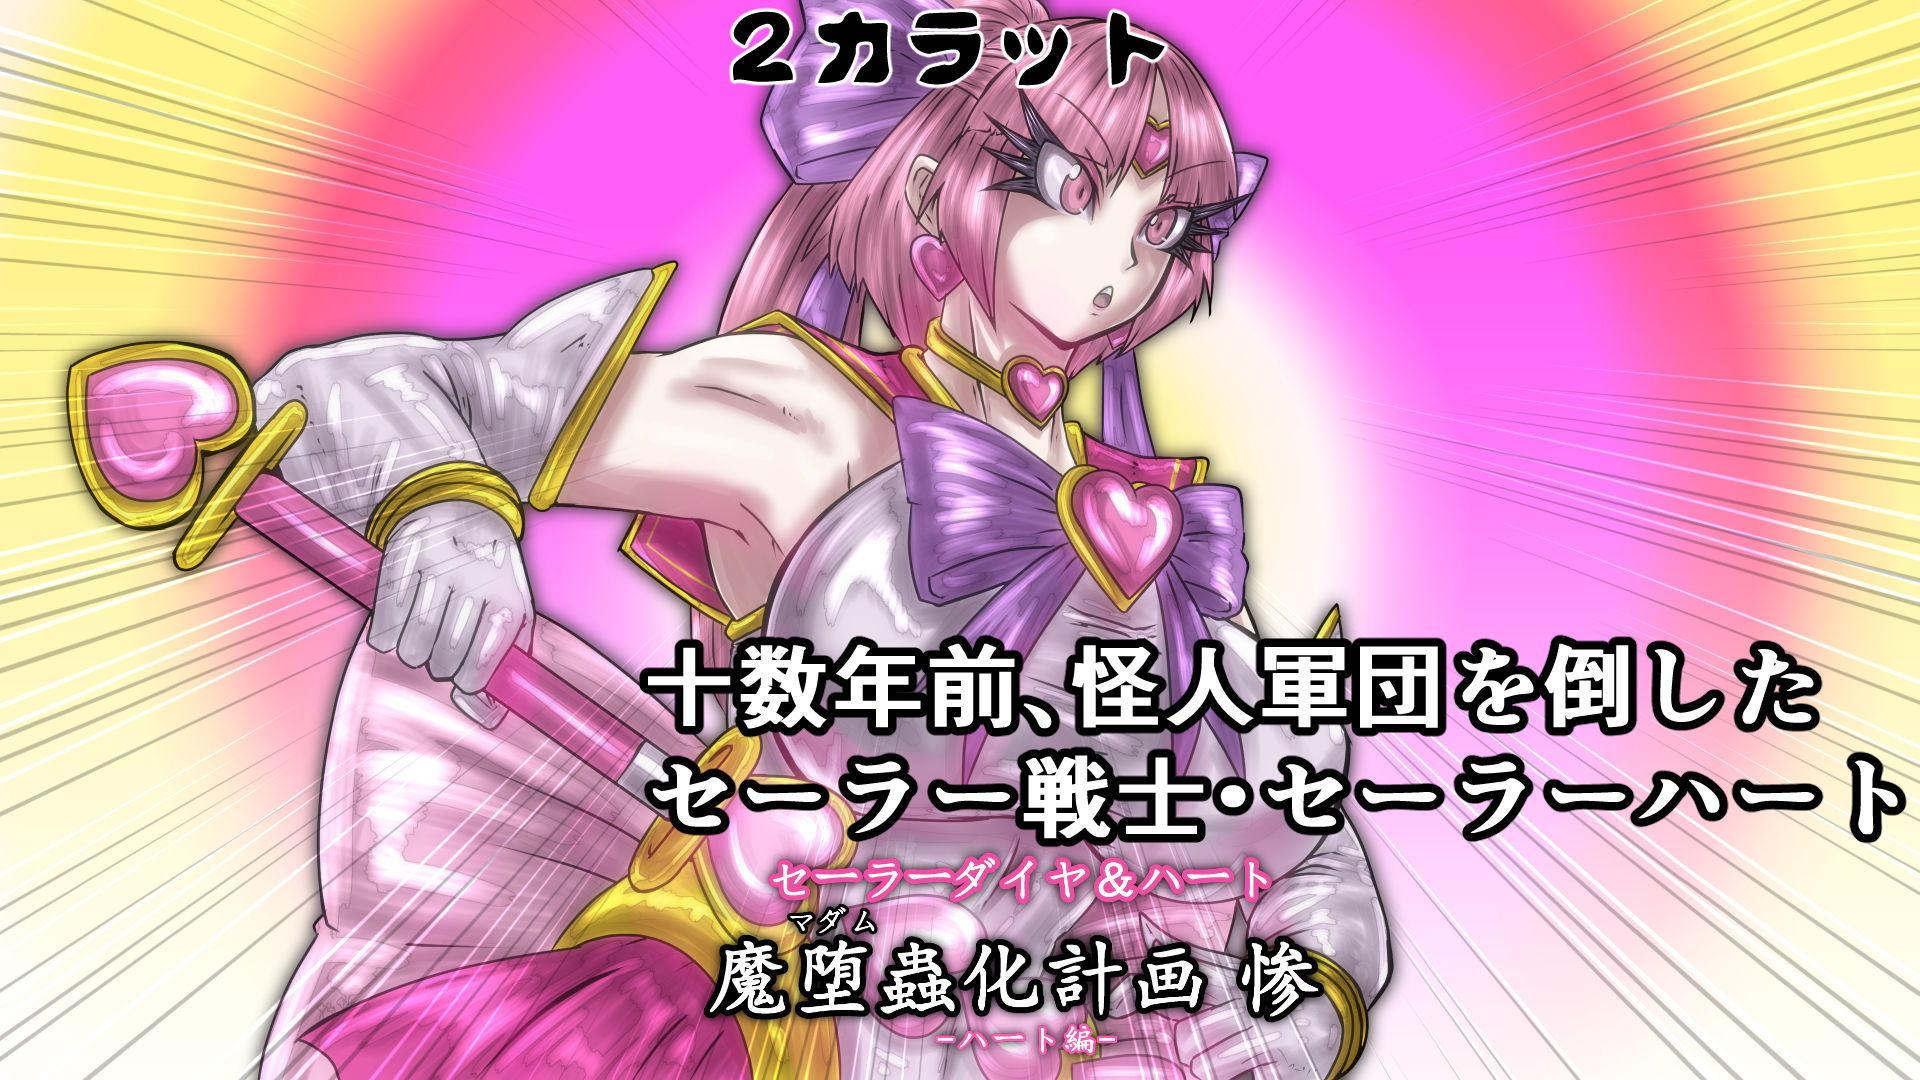 【2CARAT 同人】セーラーダイヤ&ハート魔堕蟲化計画惨-ハート編-